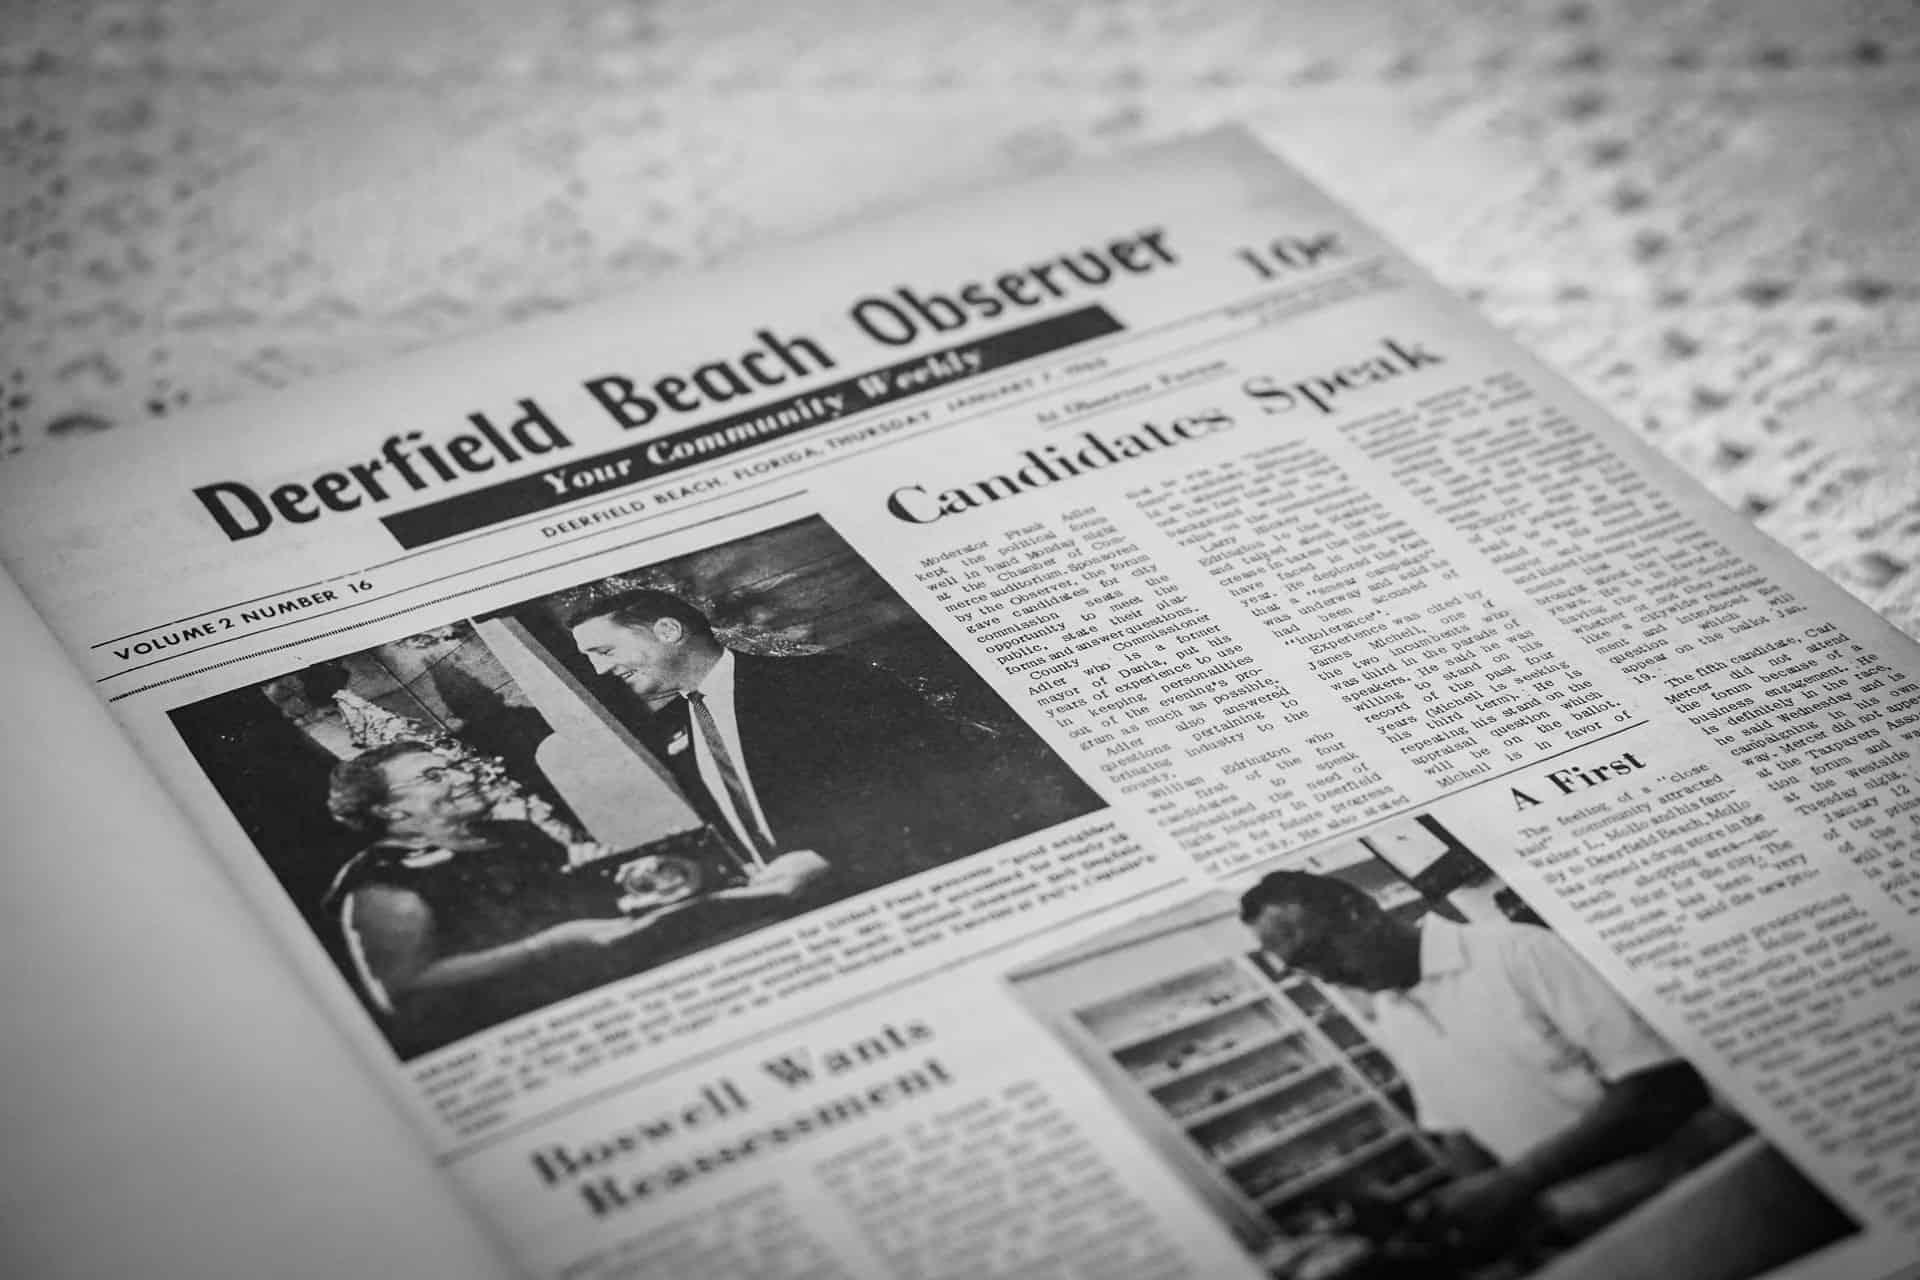 52 Deerfield Moments: #49 - Deerfield Beach Observer